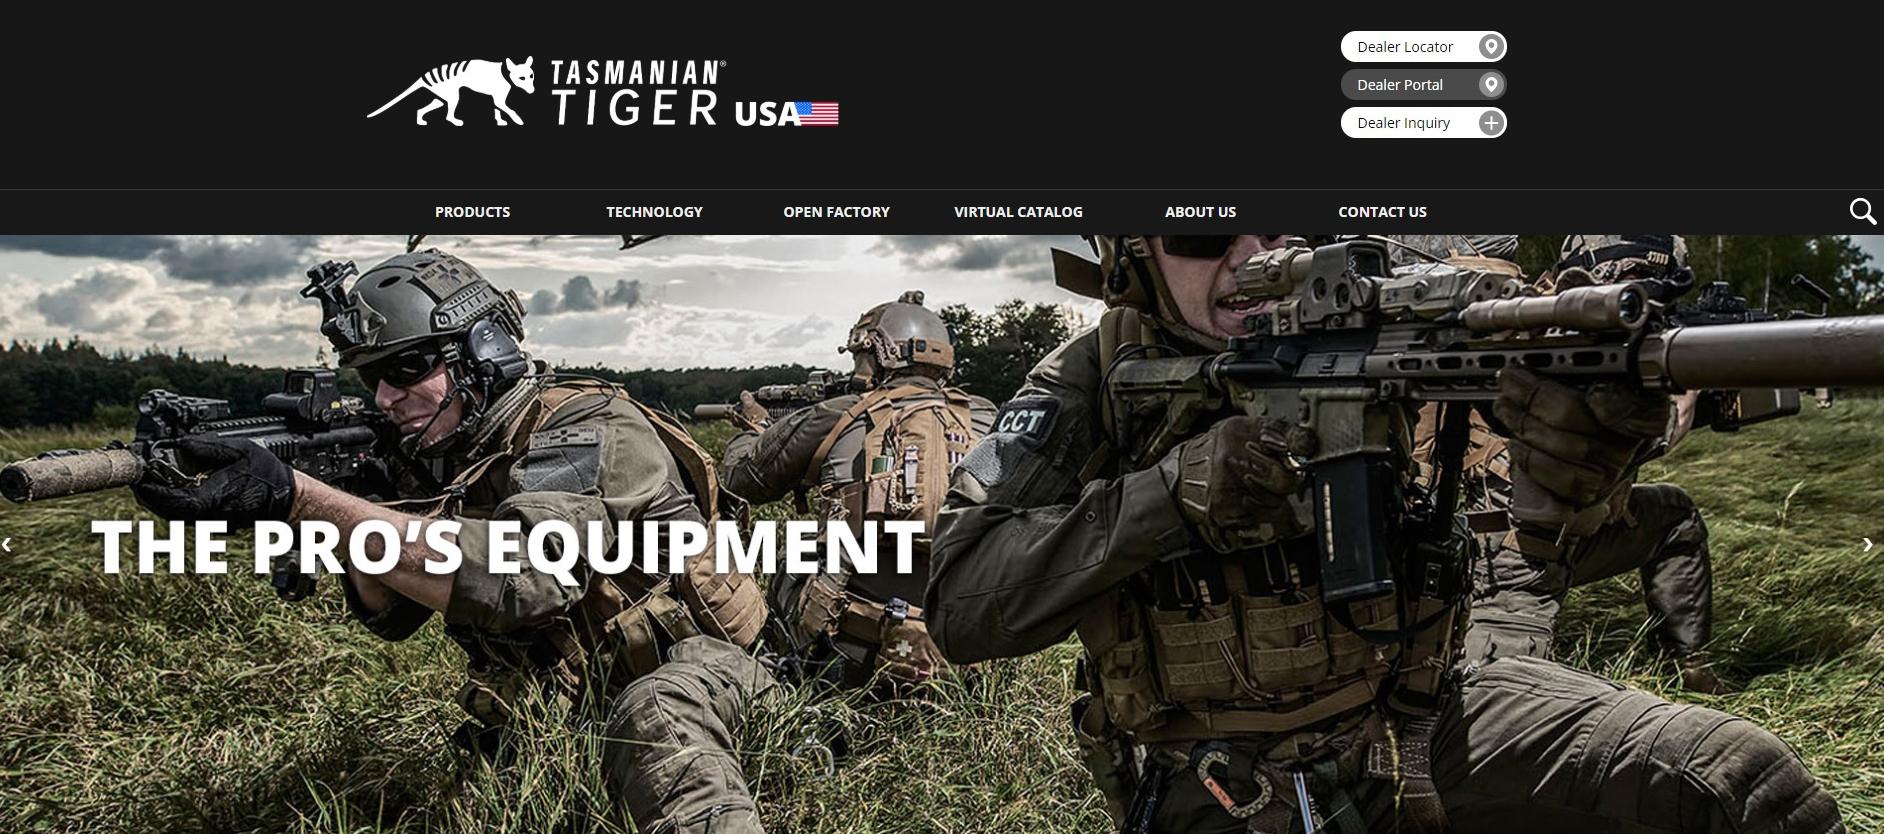 Tasmanian Tiger® USA Launches New Website and Social Media Platforms